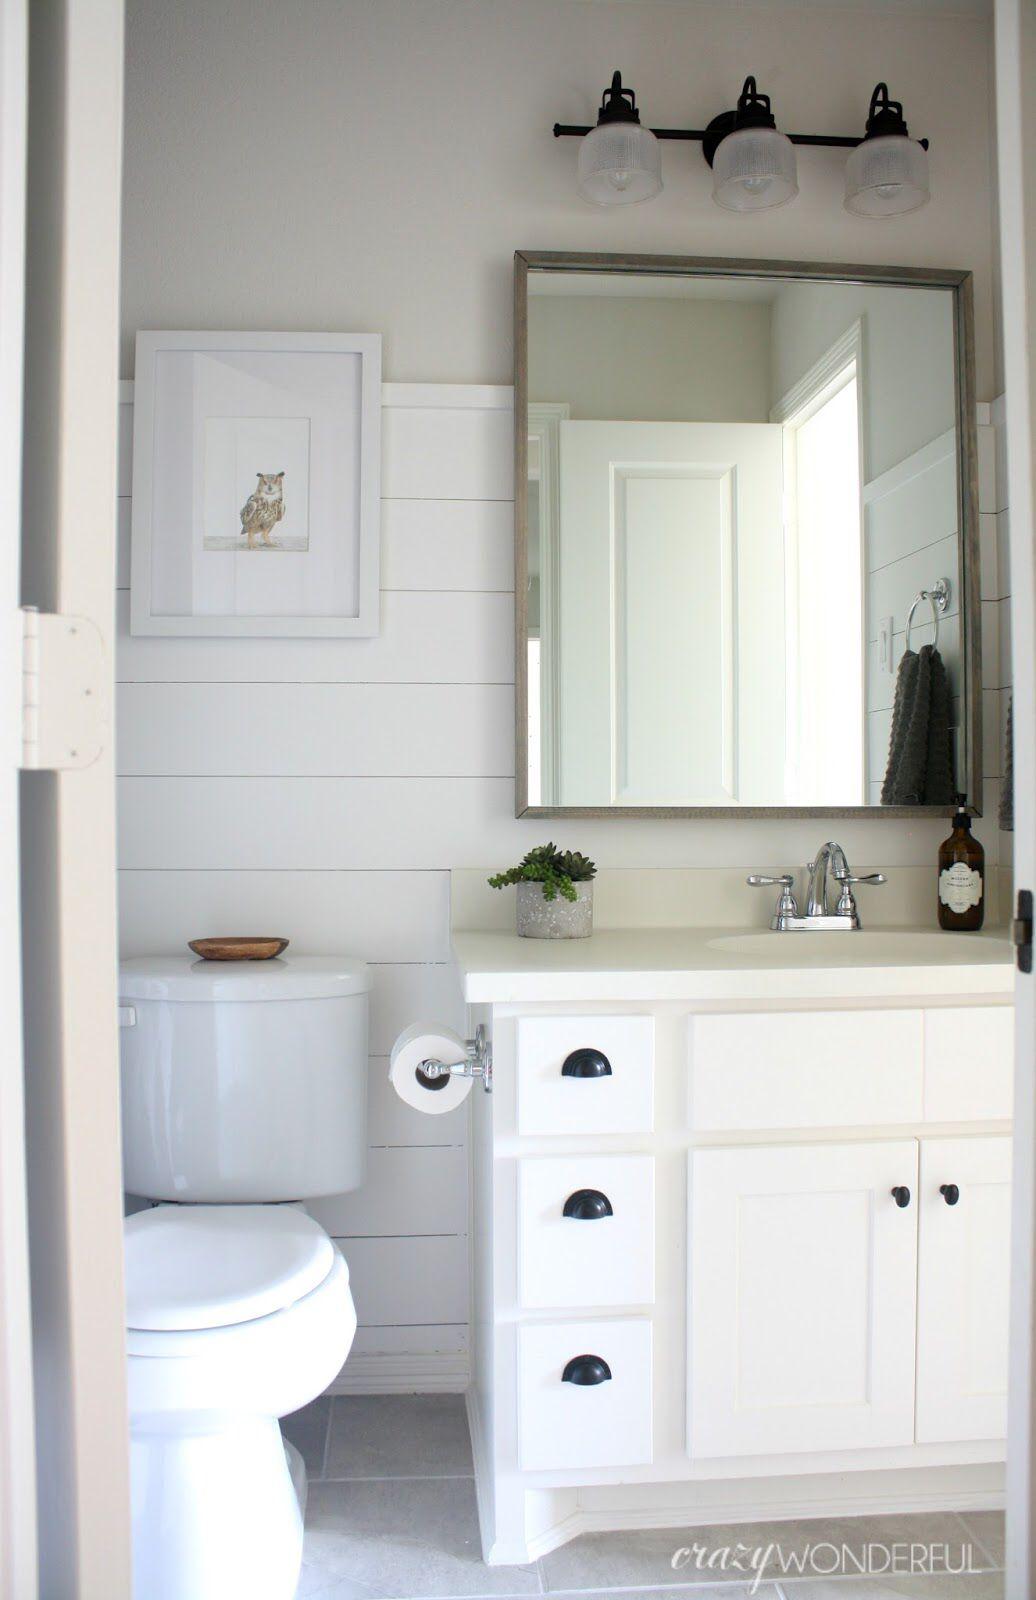 10 Beautiful Half Bathroom Ideas For Your Home Samoreals Peredelka Vannoj Komnaty Rekonstrukciya Vannoj Idei Dlya Vannyh Komnat Svoimi Rukami